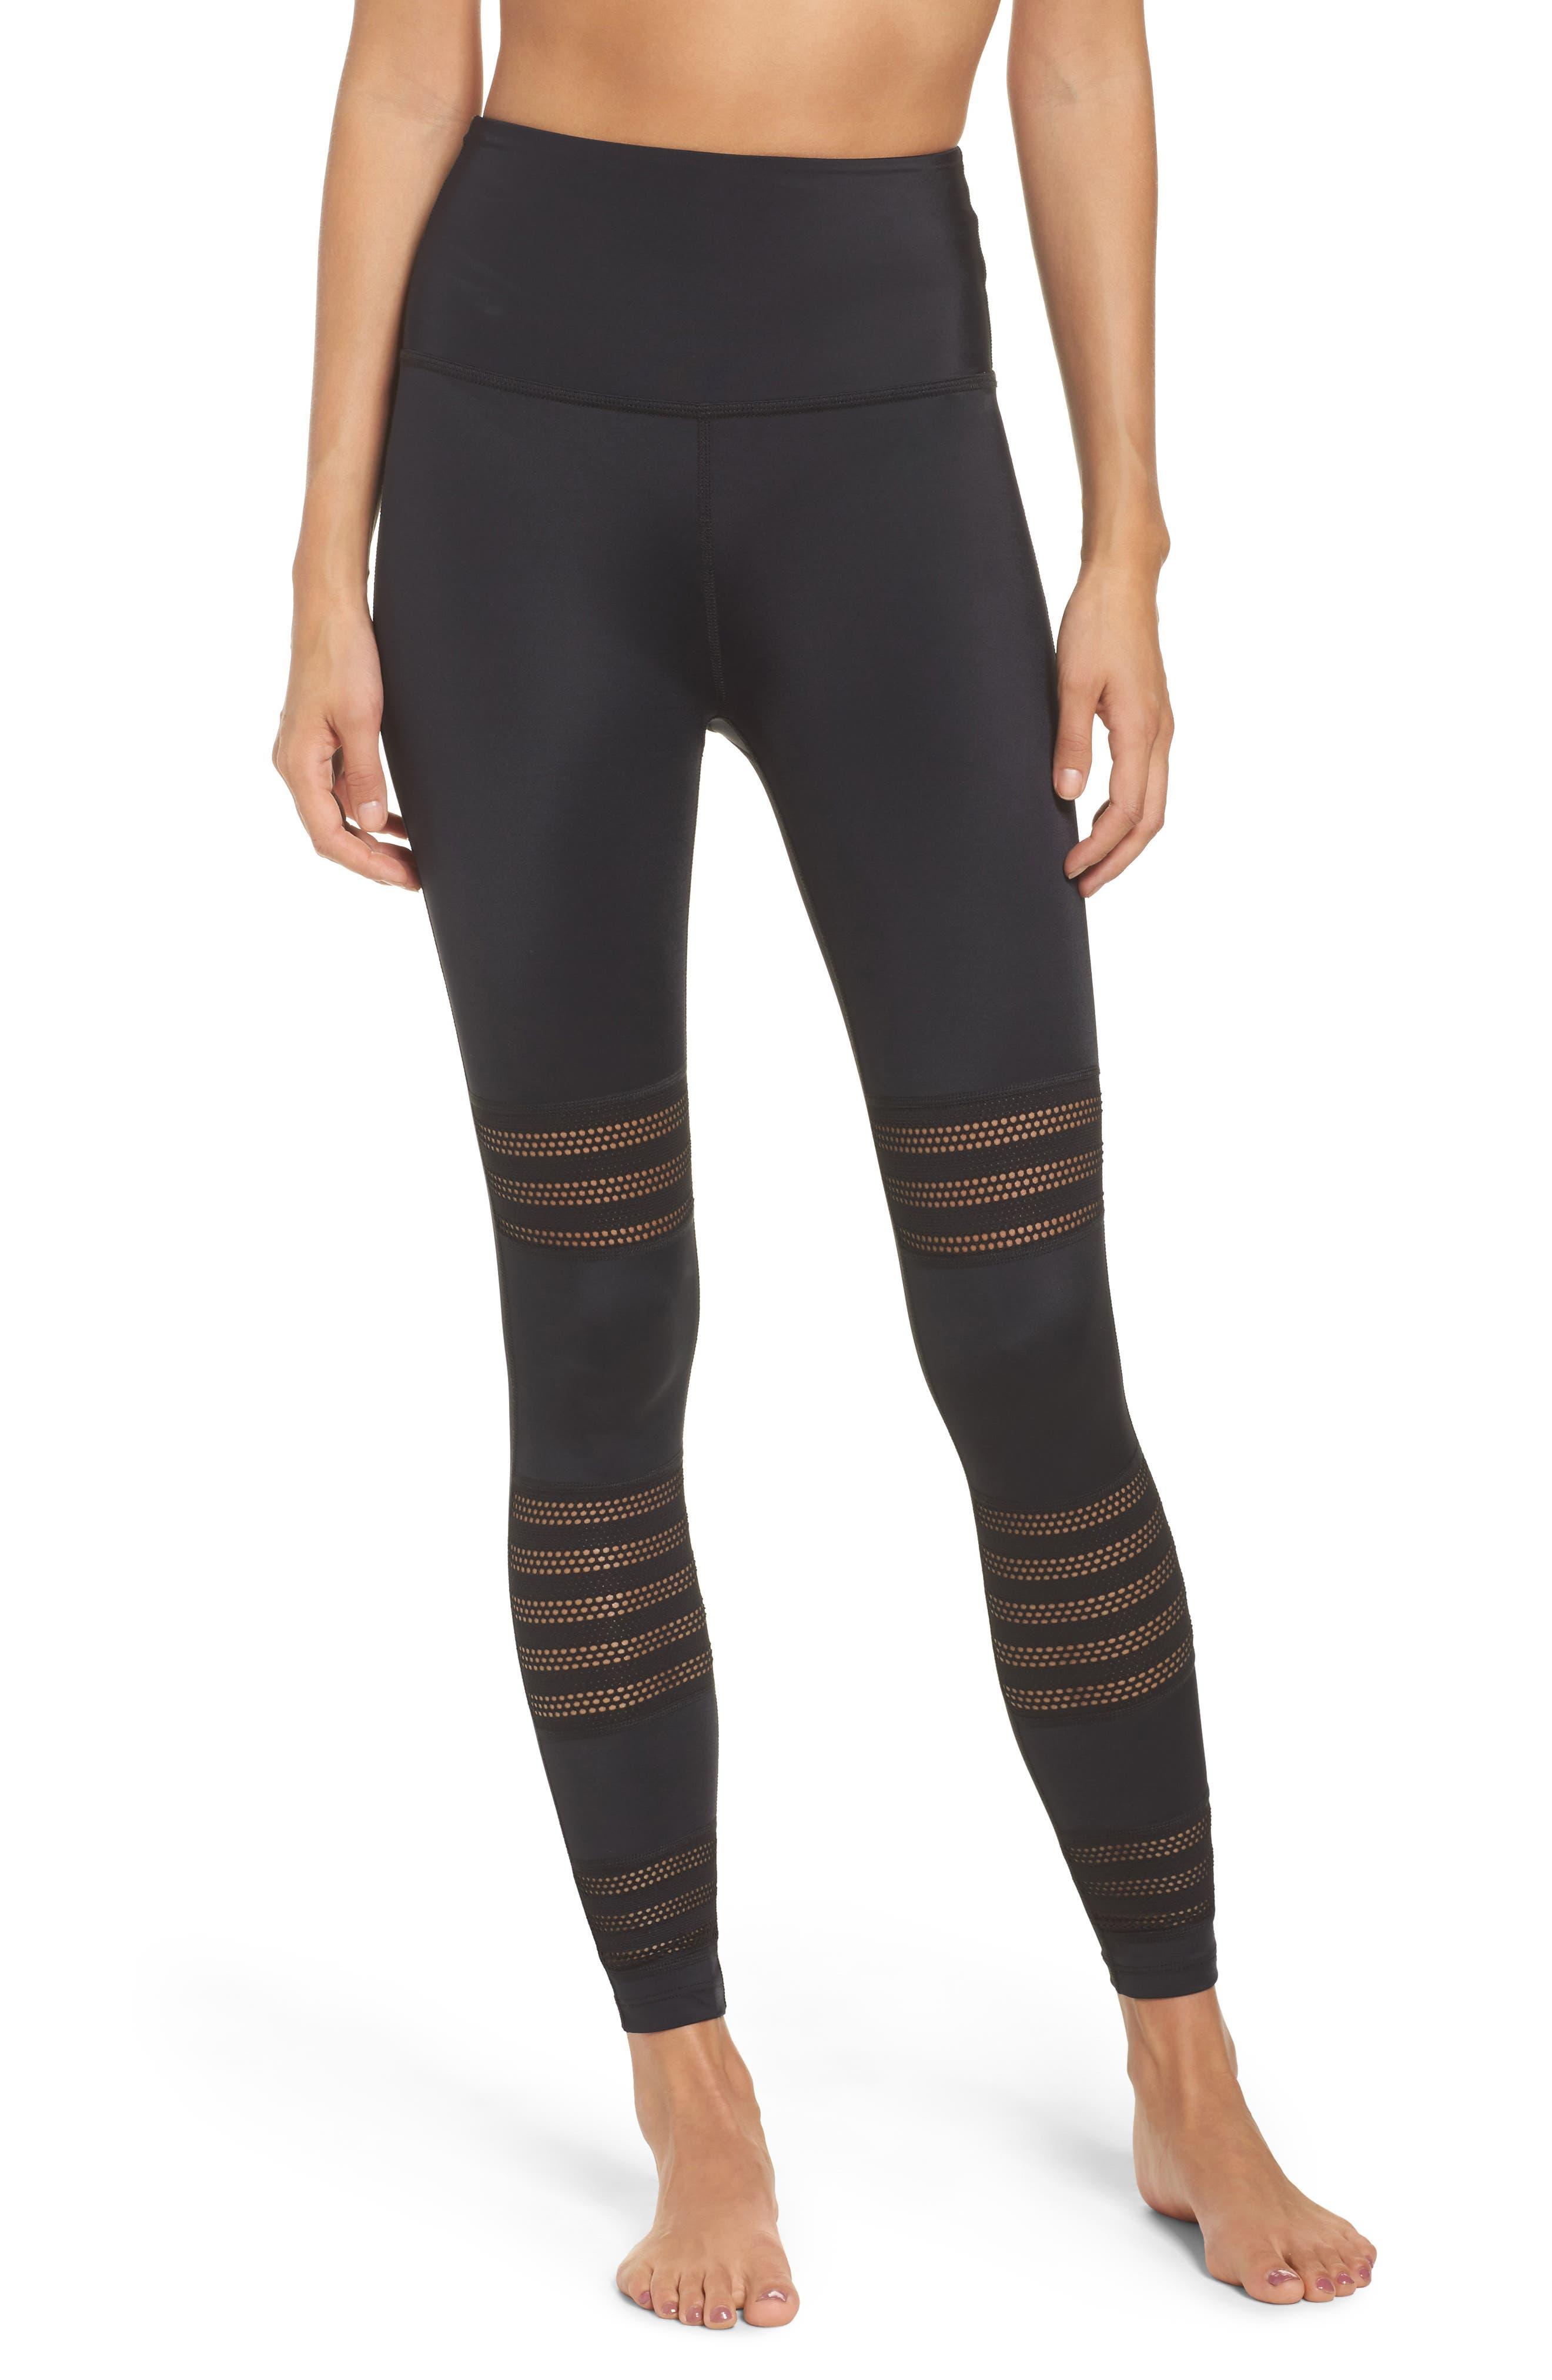 Main Image - Beyond Yoga Mesh to Impress High Waist Leggings